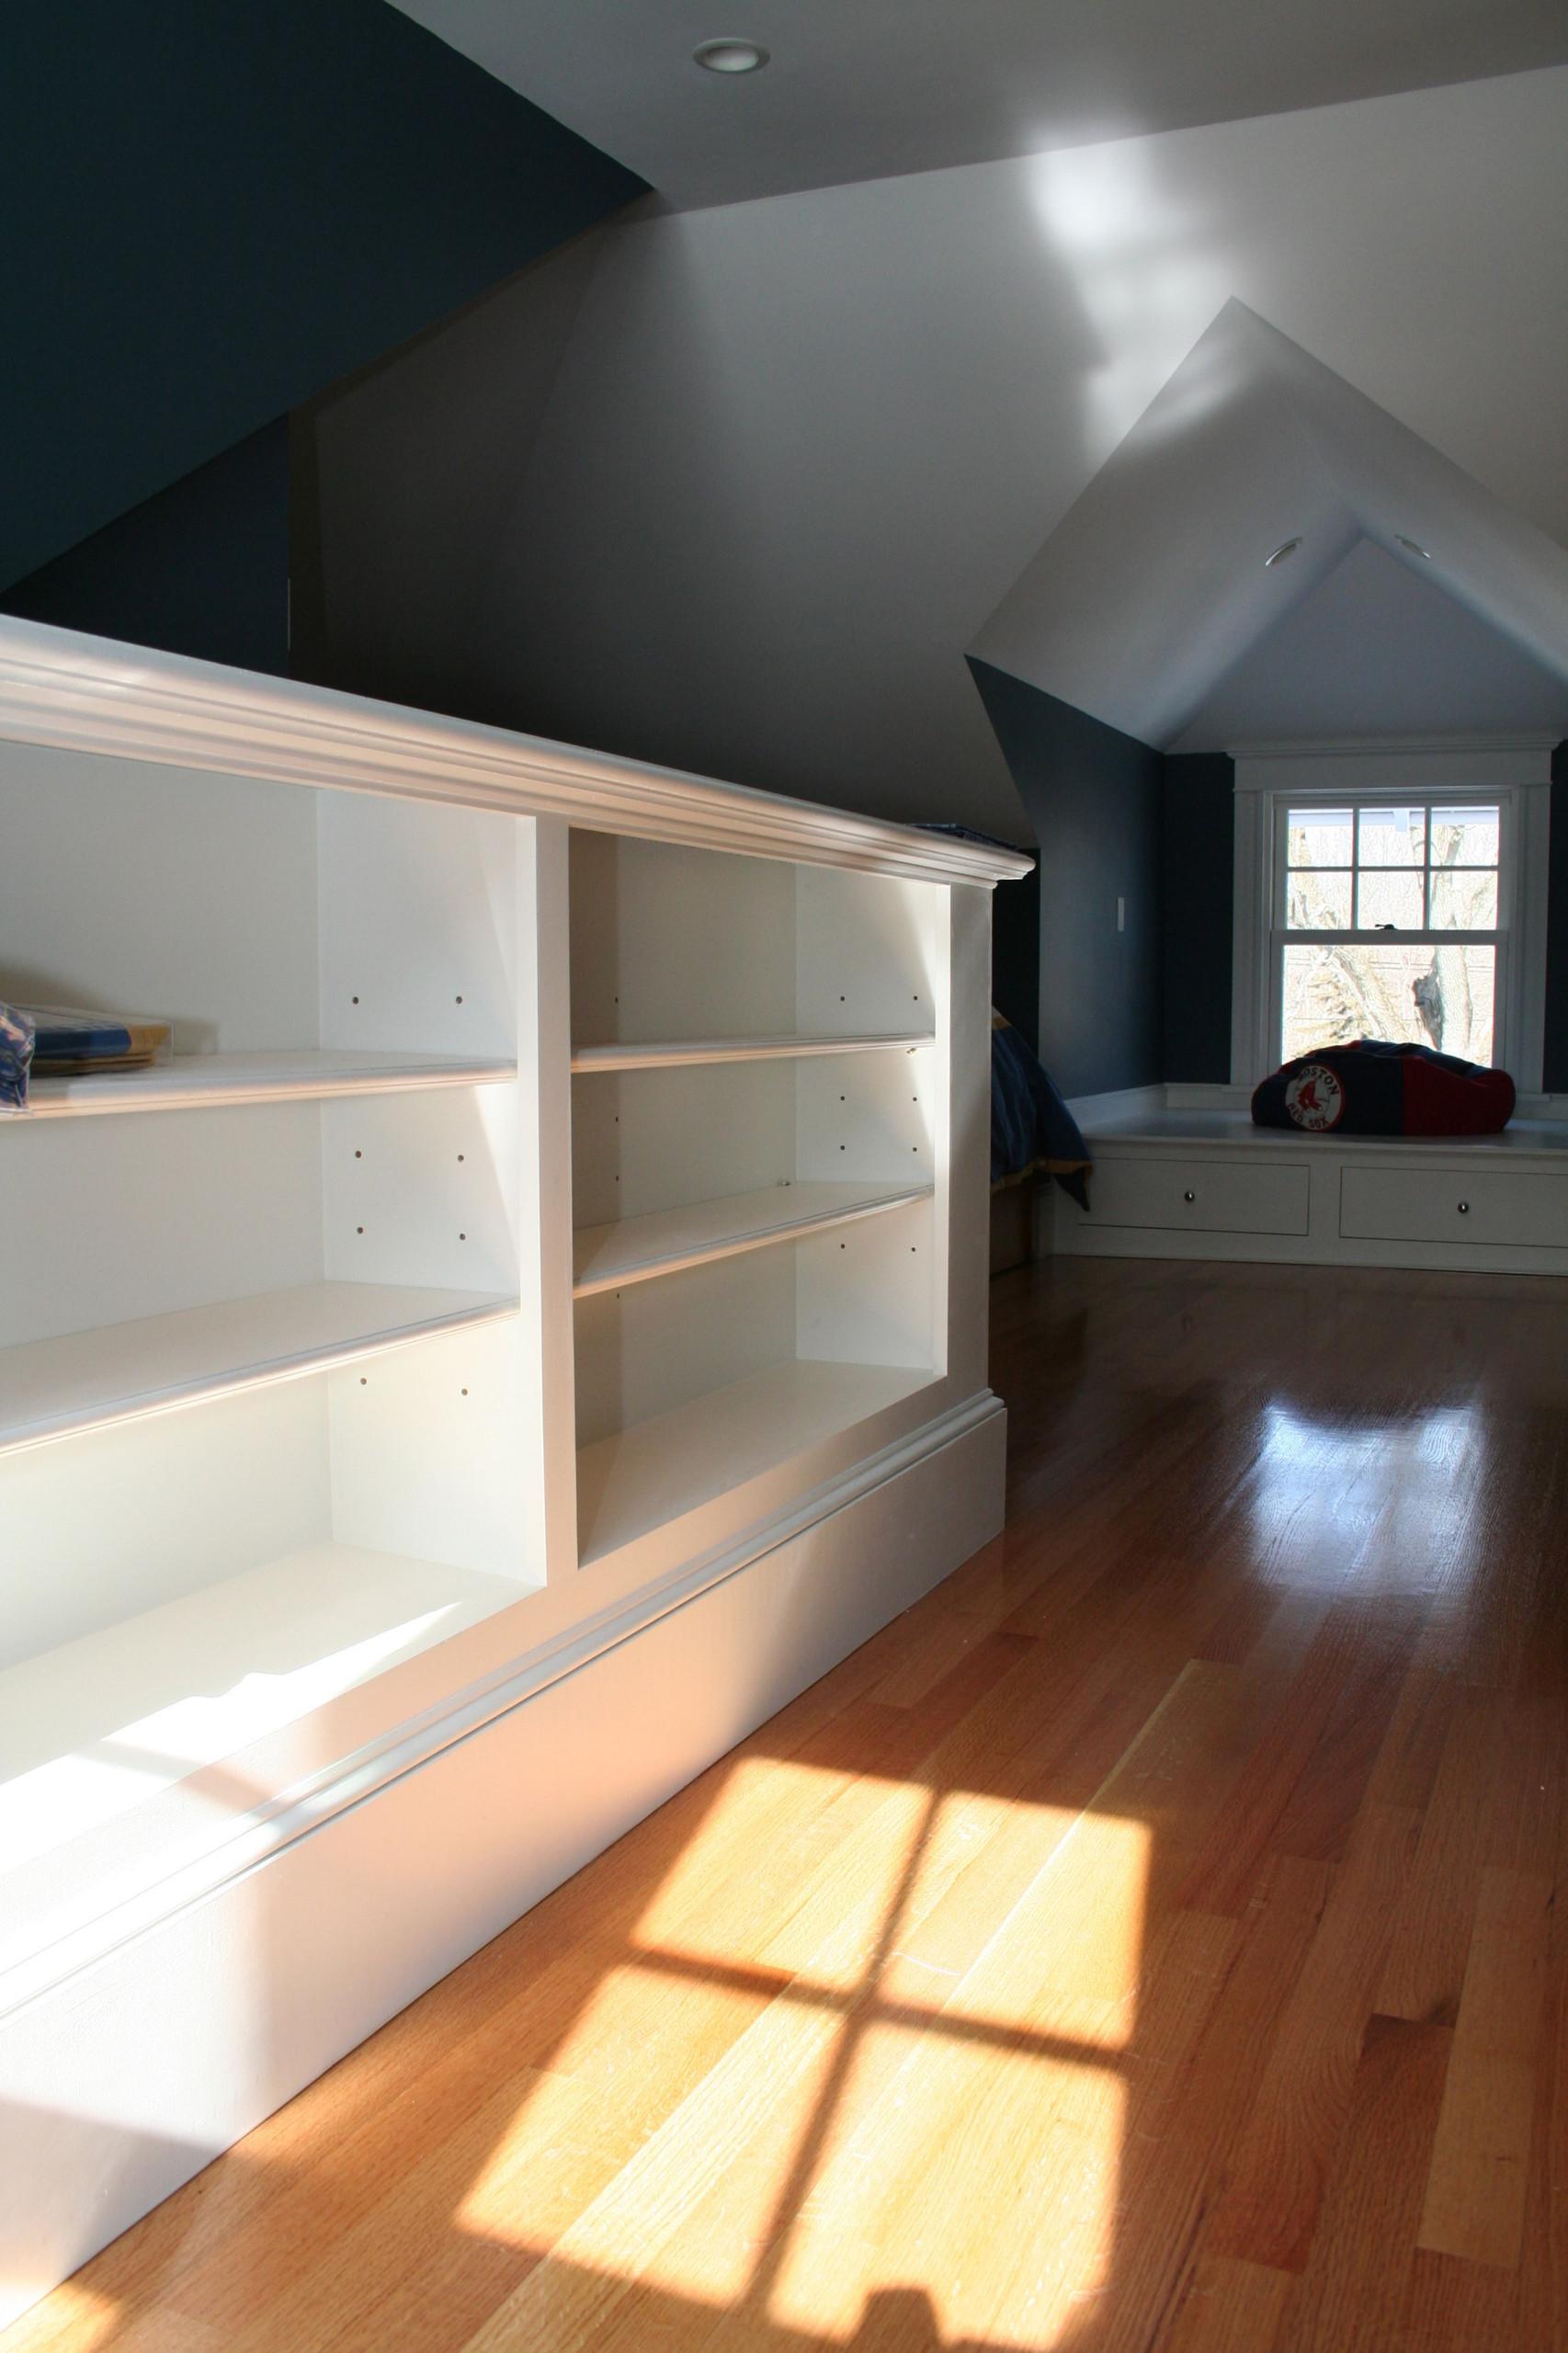 Custom Woodworking / Carpentry